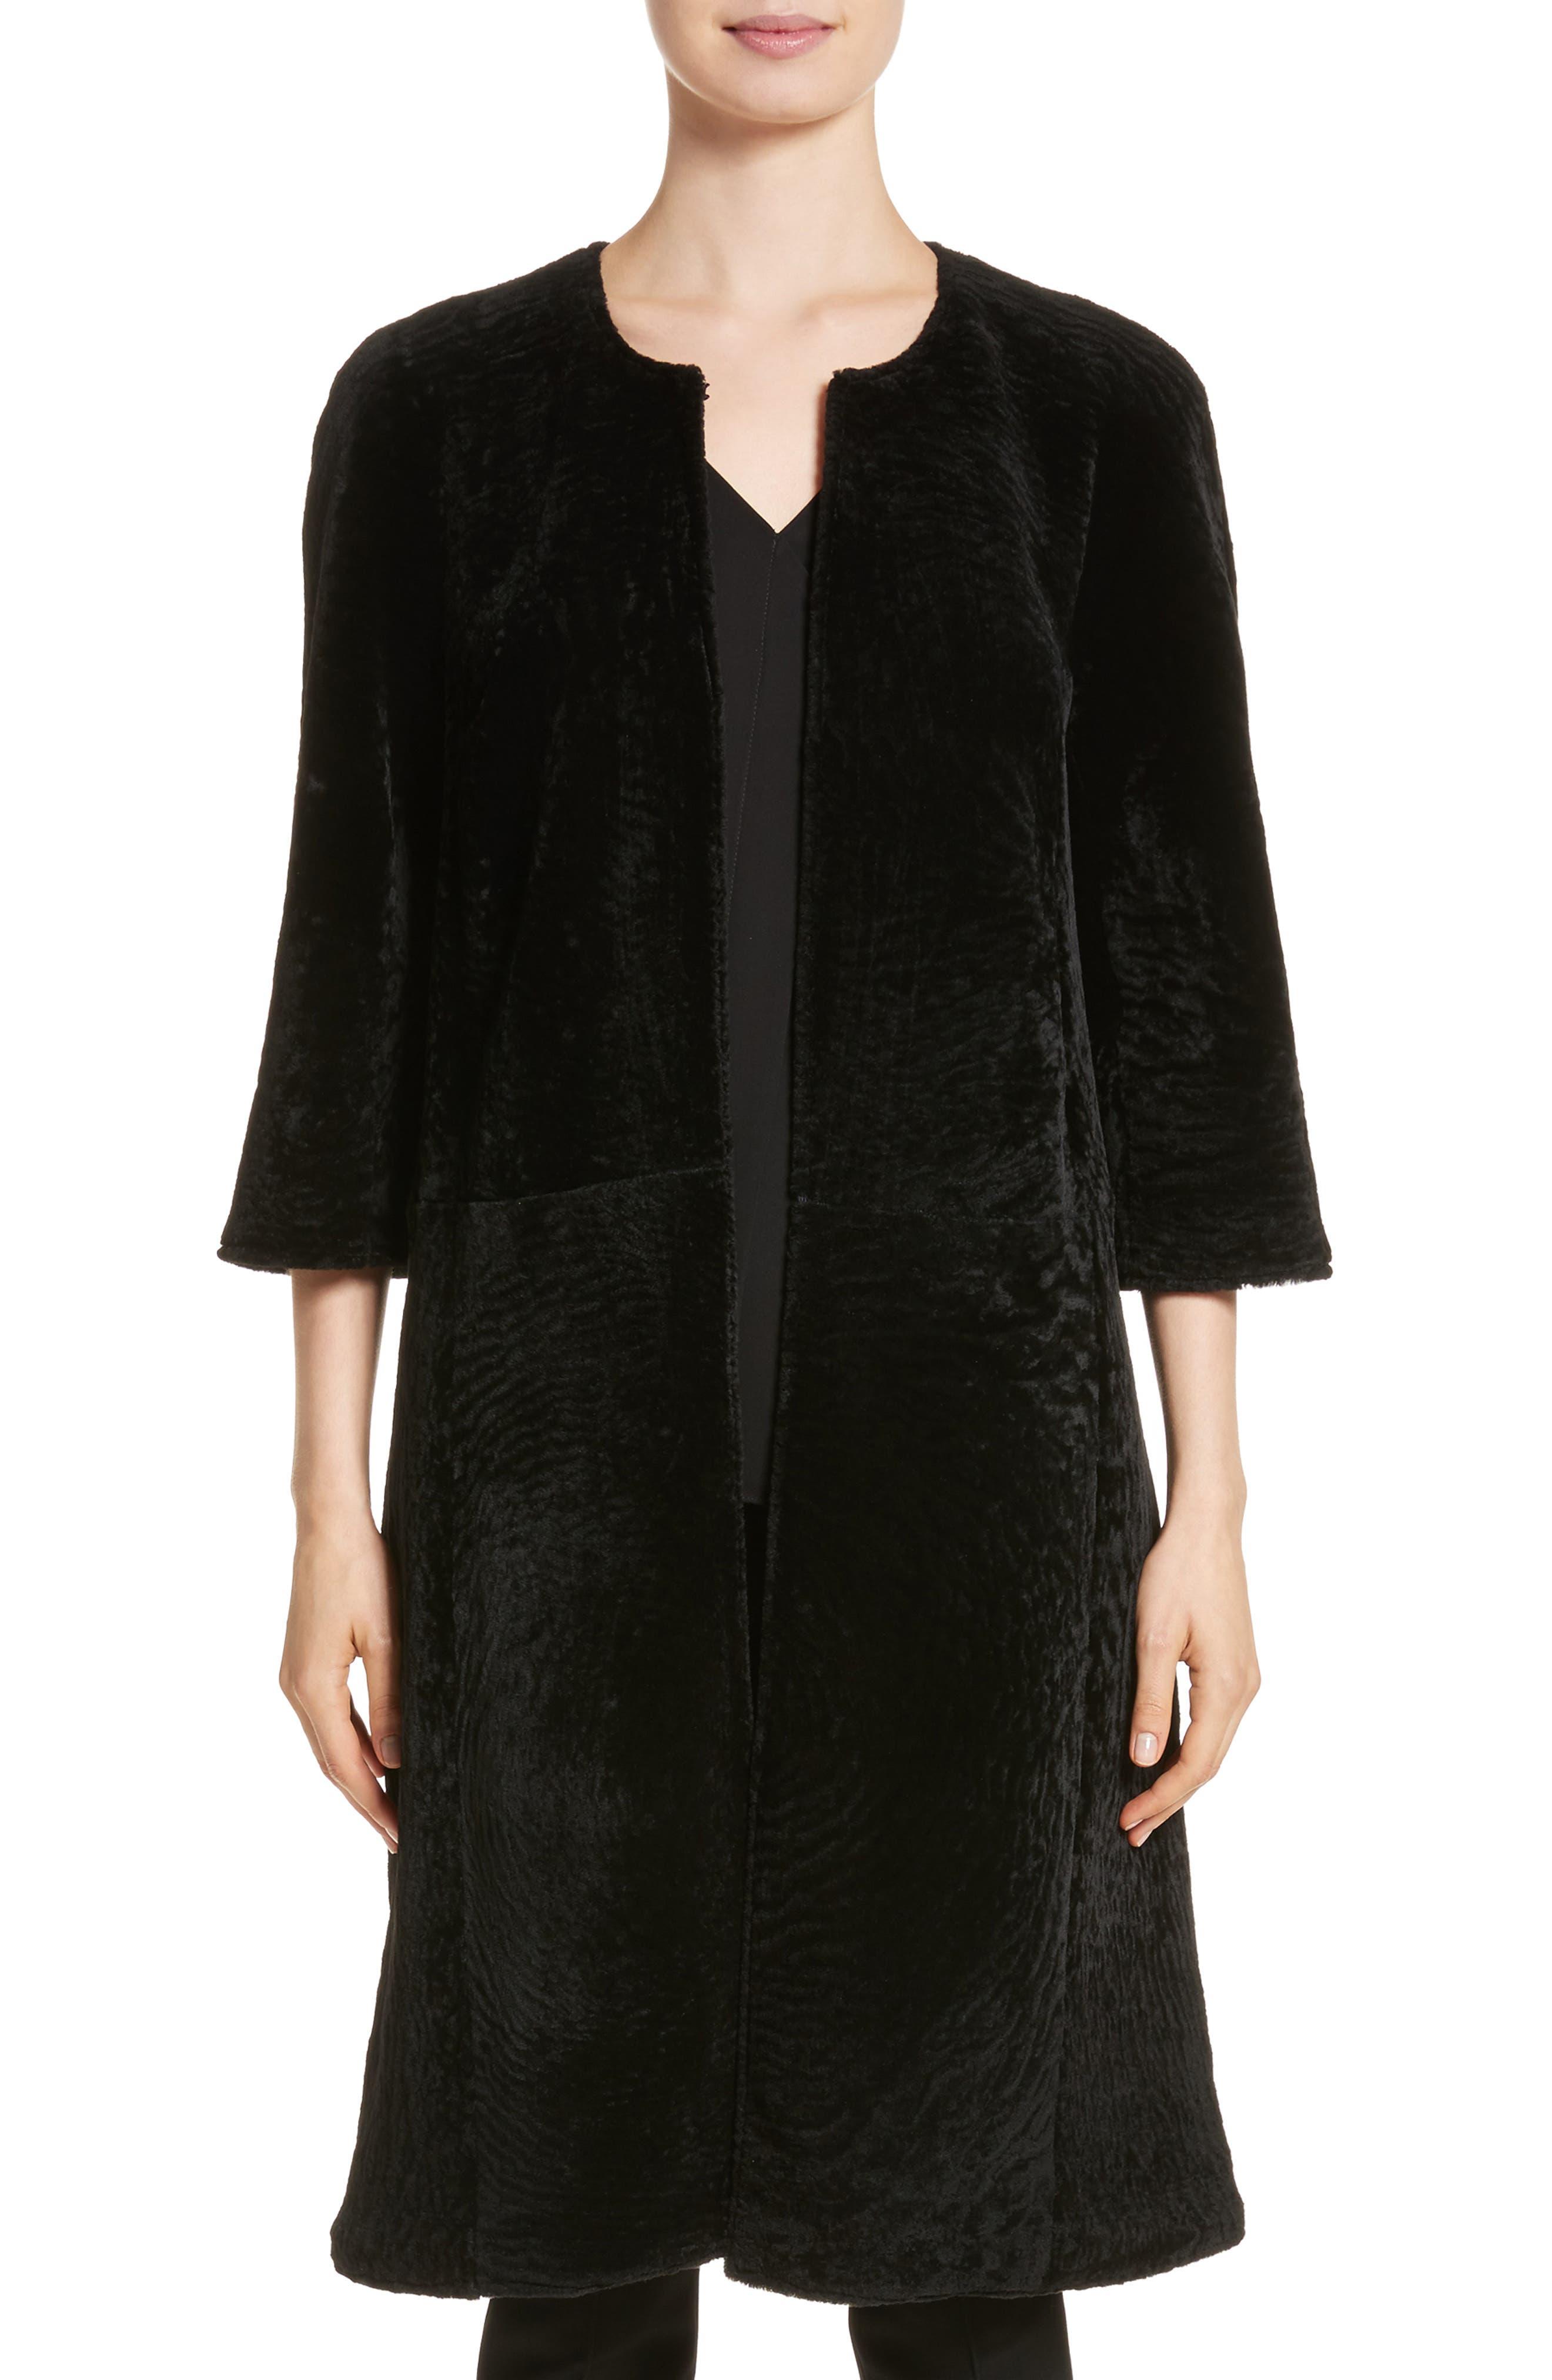 Genuine Textured Lamb Fur Jacket,                             Main thumbnail 1, color,                             Caviar